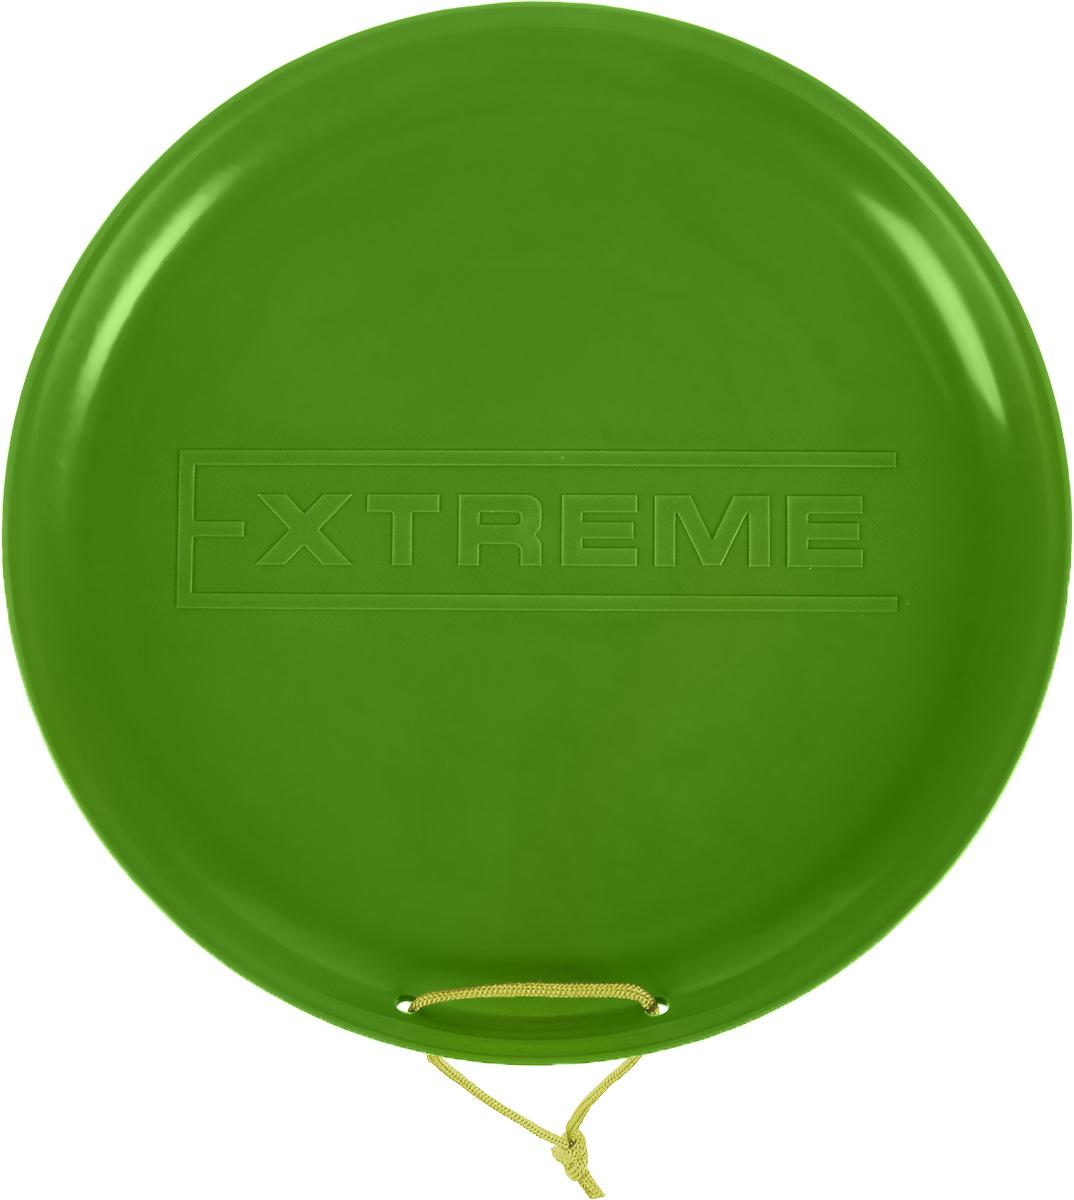 "Санки-ледянки Престиж ""Экстрим"", цвет: зеленый, диаметр 40 см 336909"